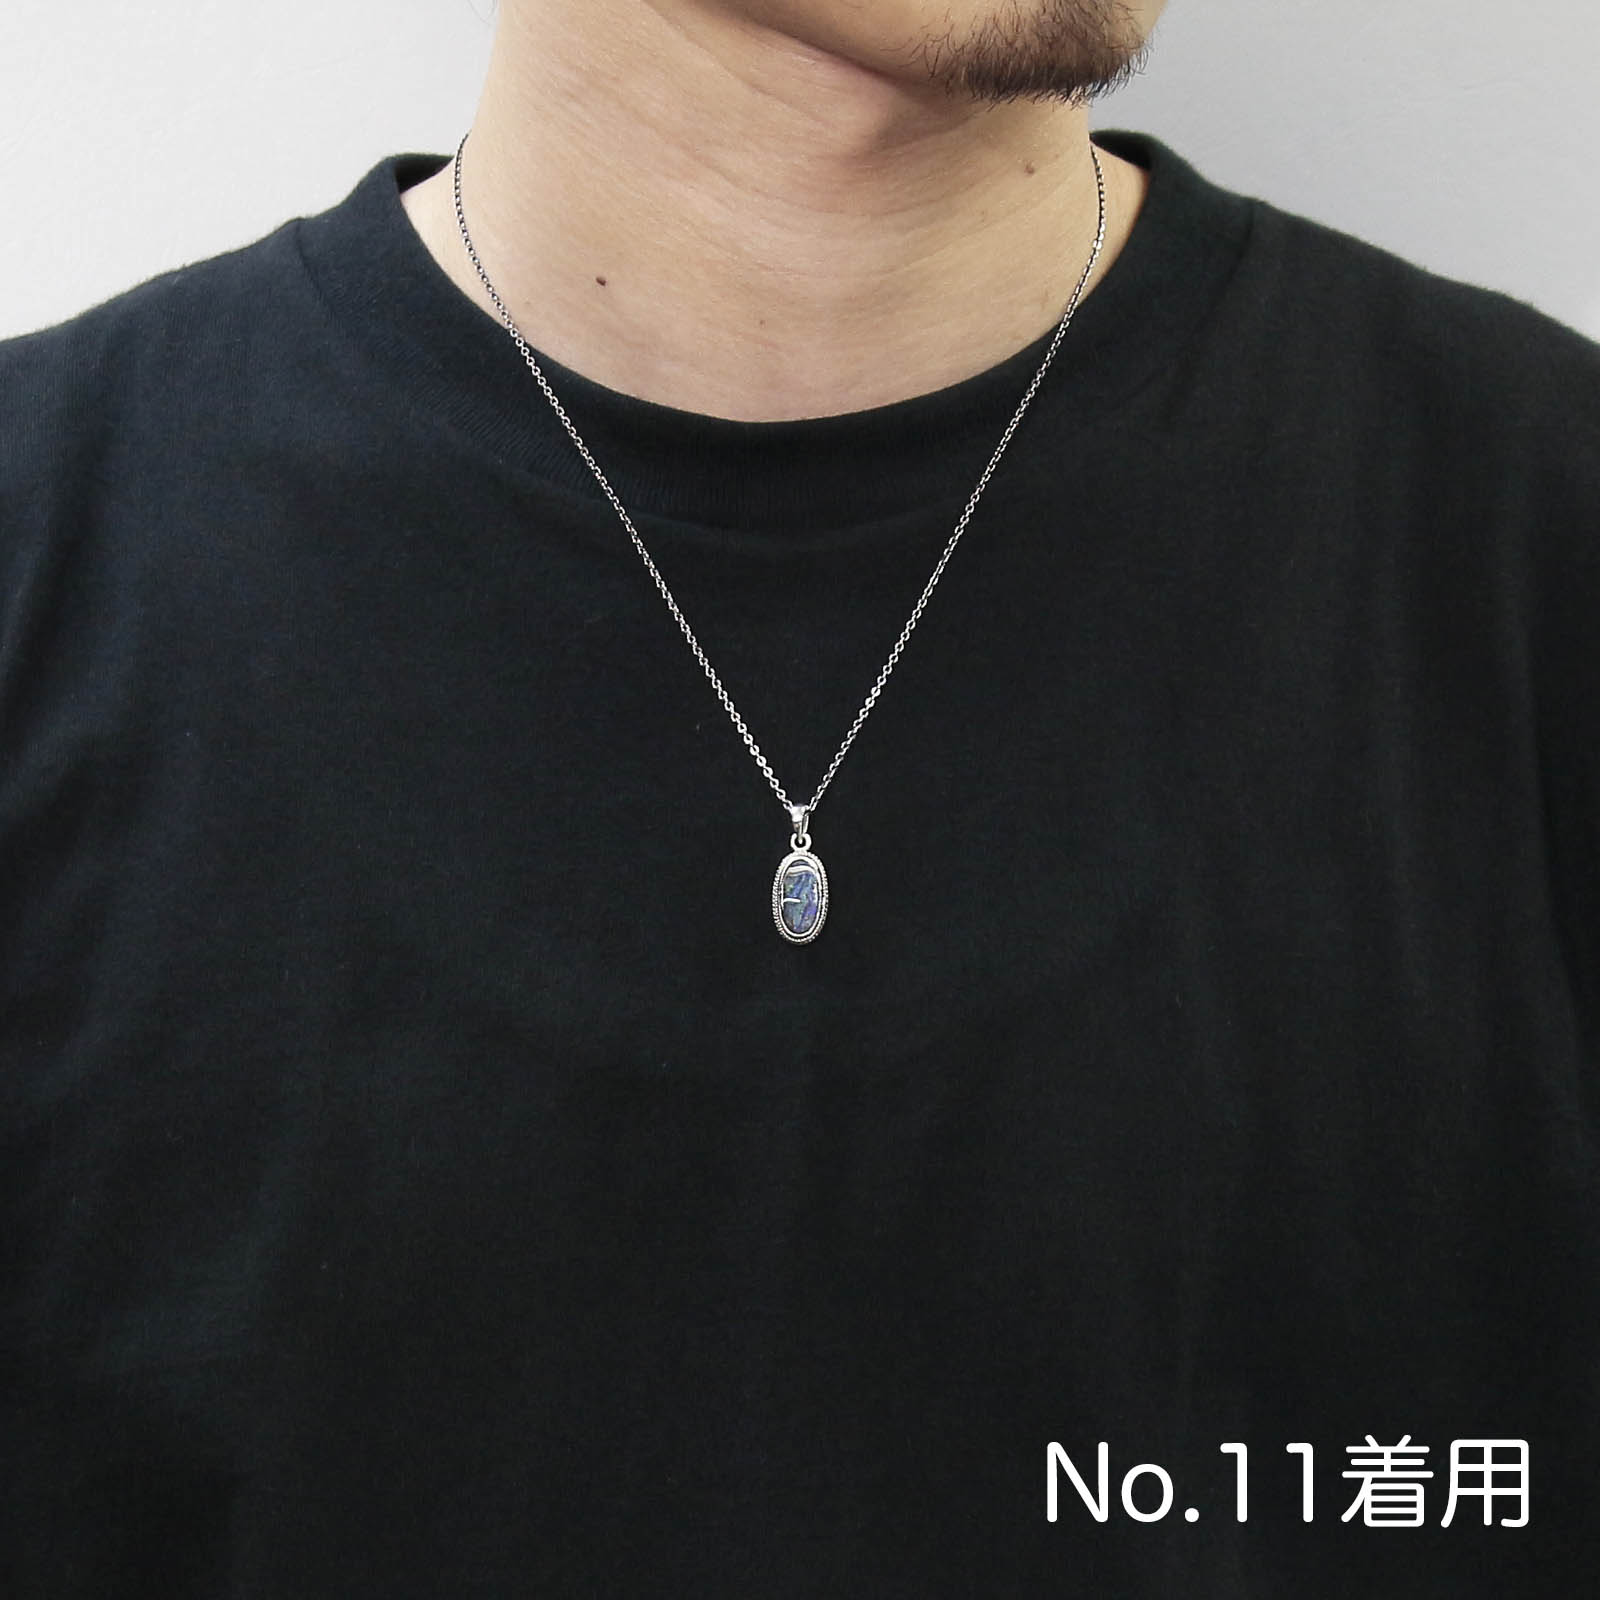 Medium Opal Stone Necklace